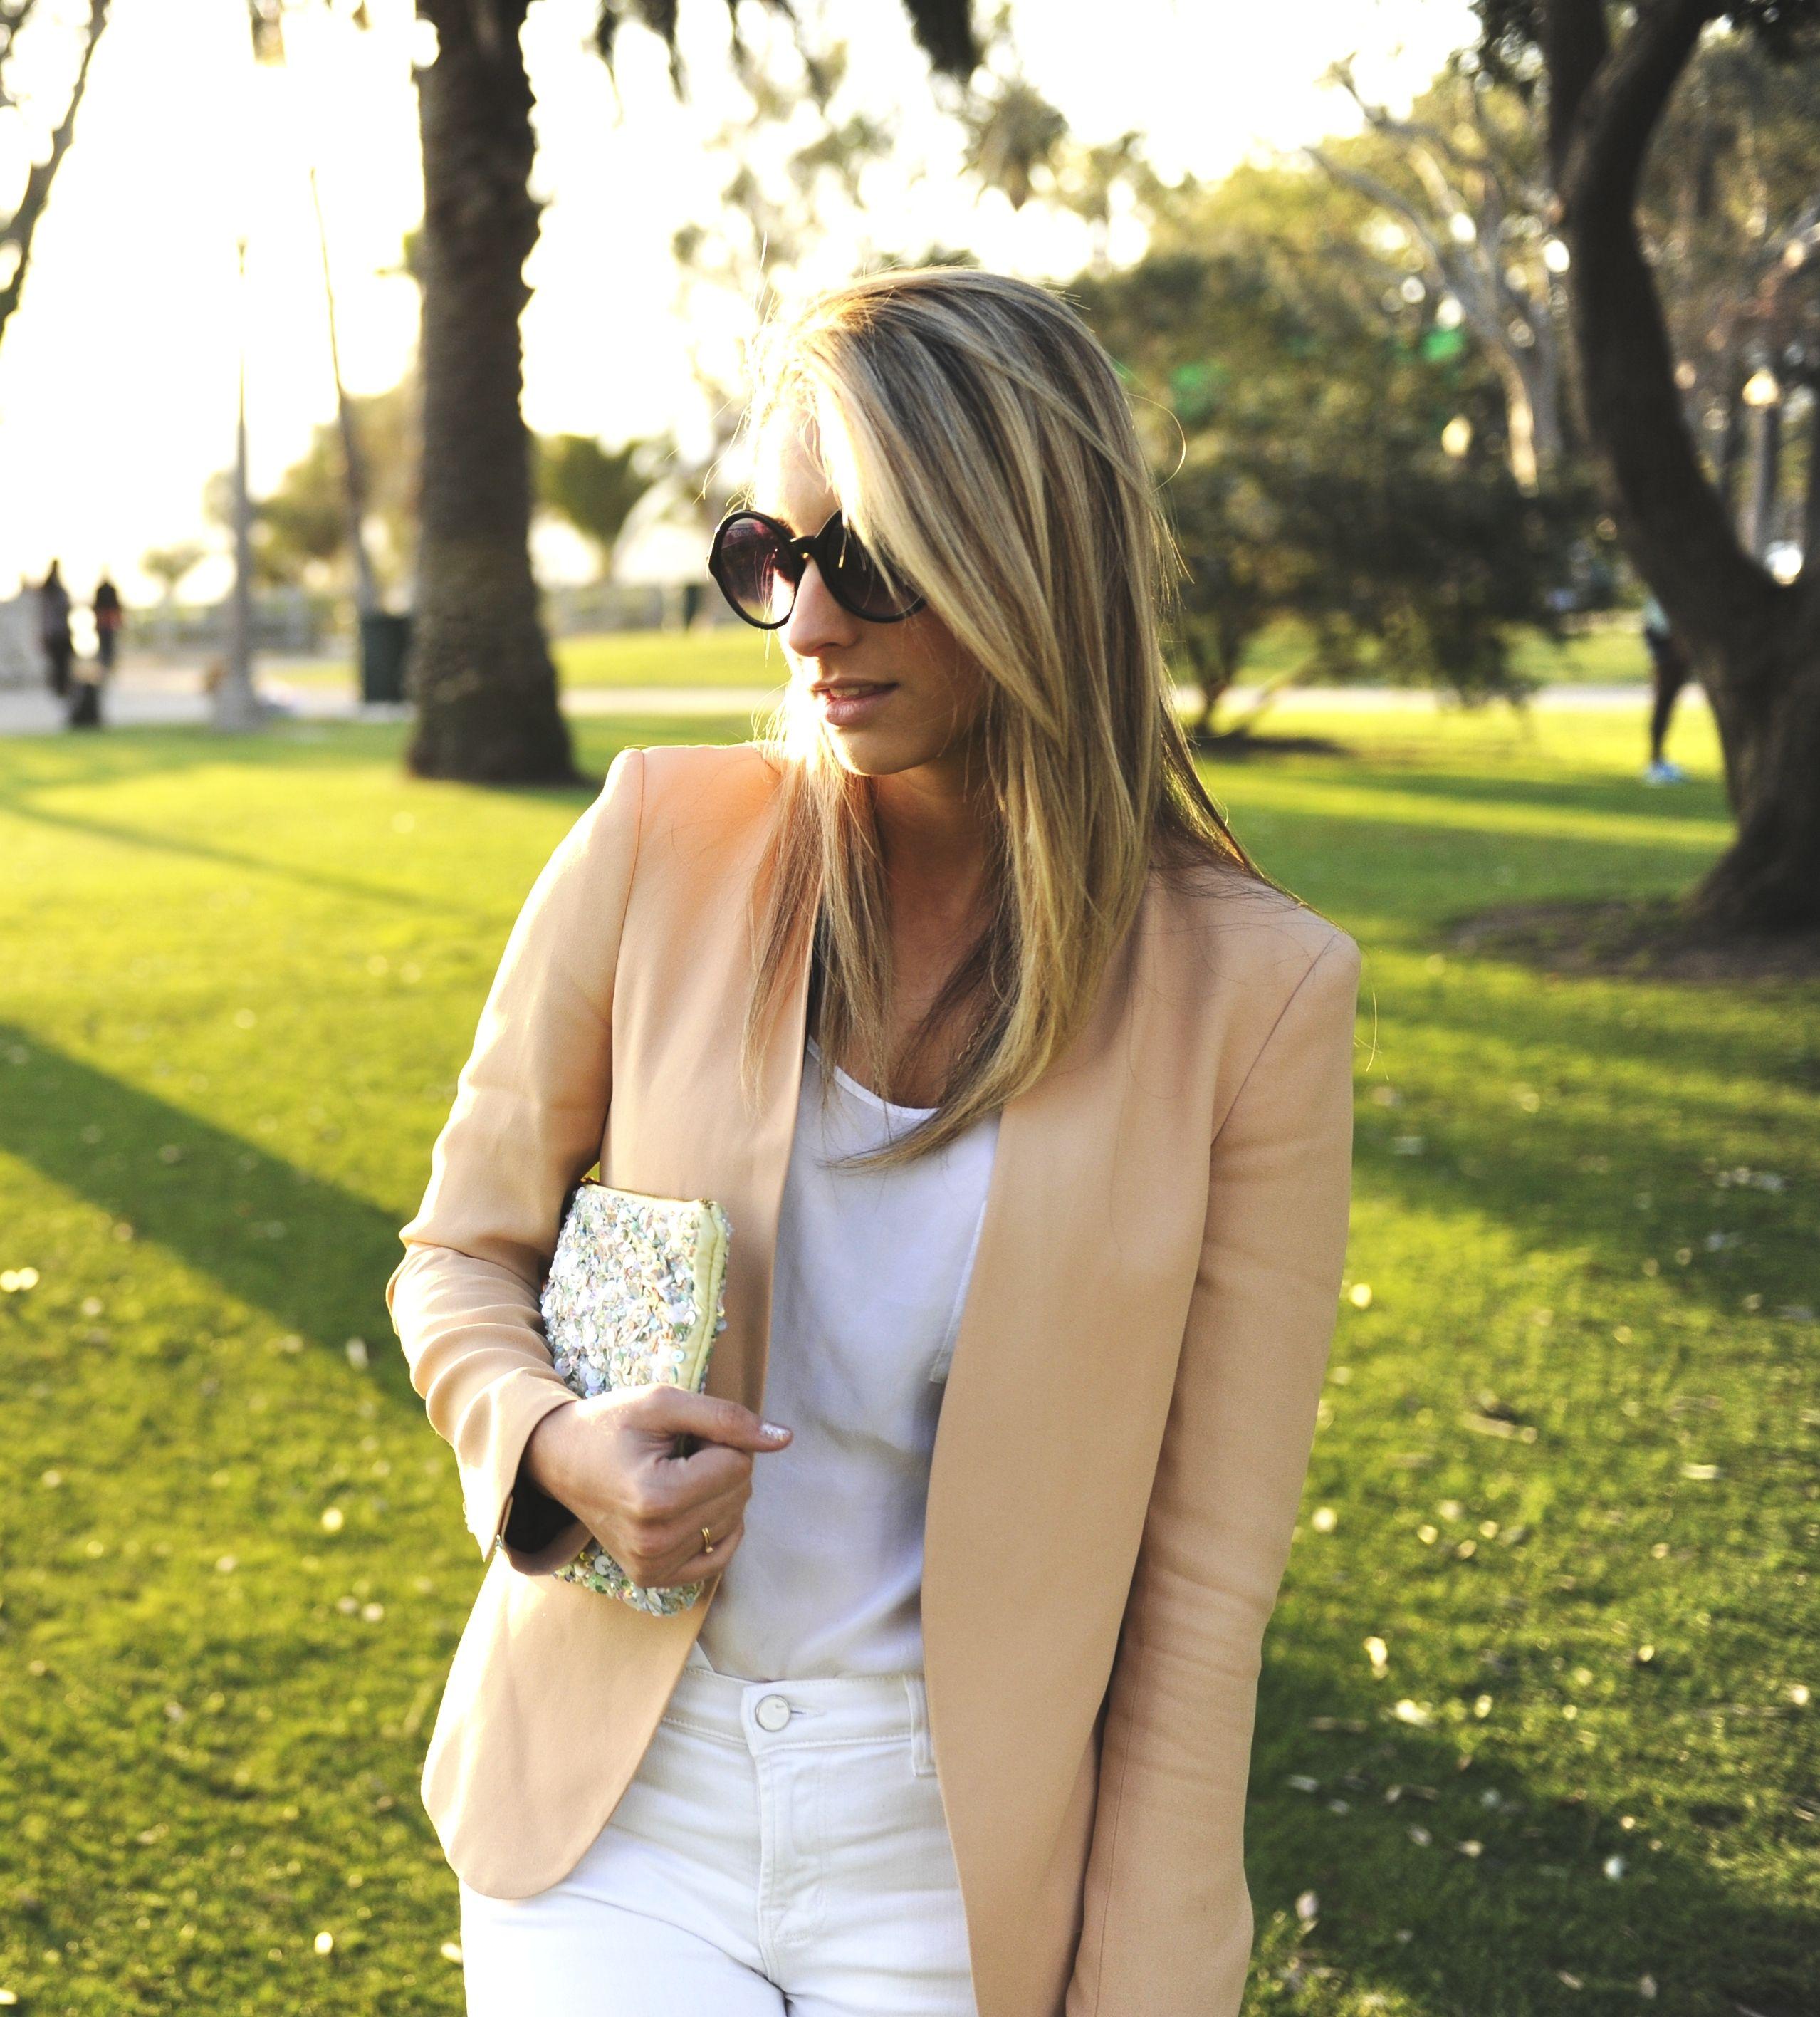 Fashion Beauty Internships: Fashion, Style, Fashion Merchandising